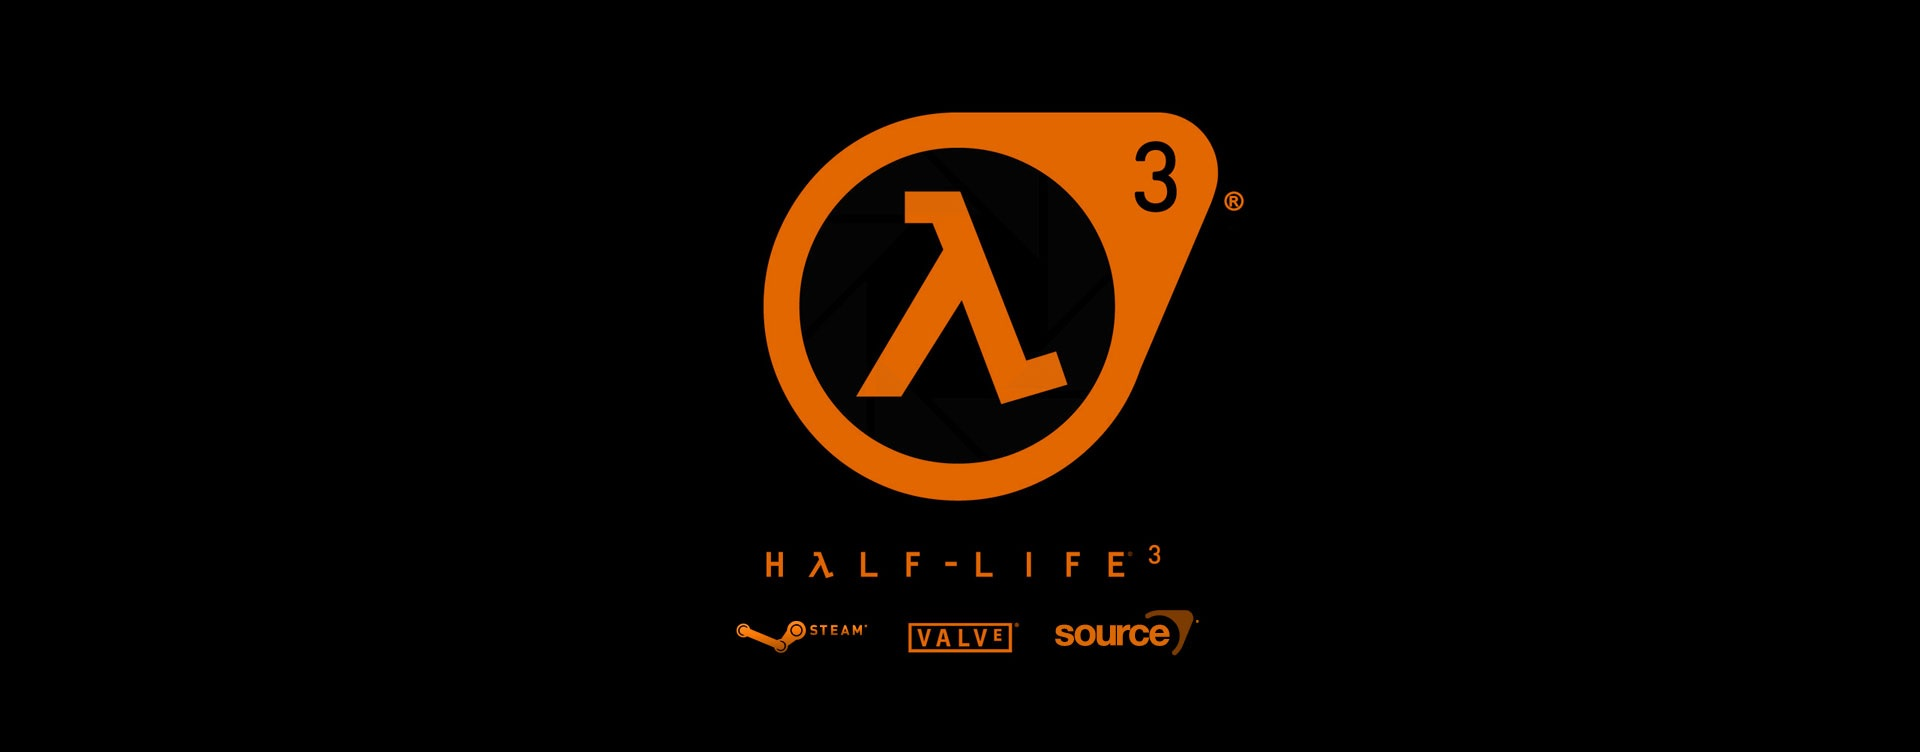 Foto de BOMBA! Enredo de Half-Life 3 pode ter vazado!!